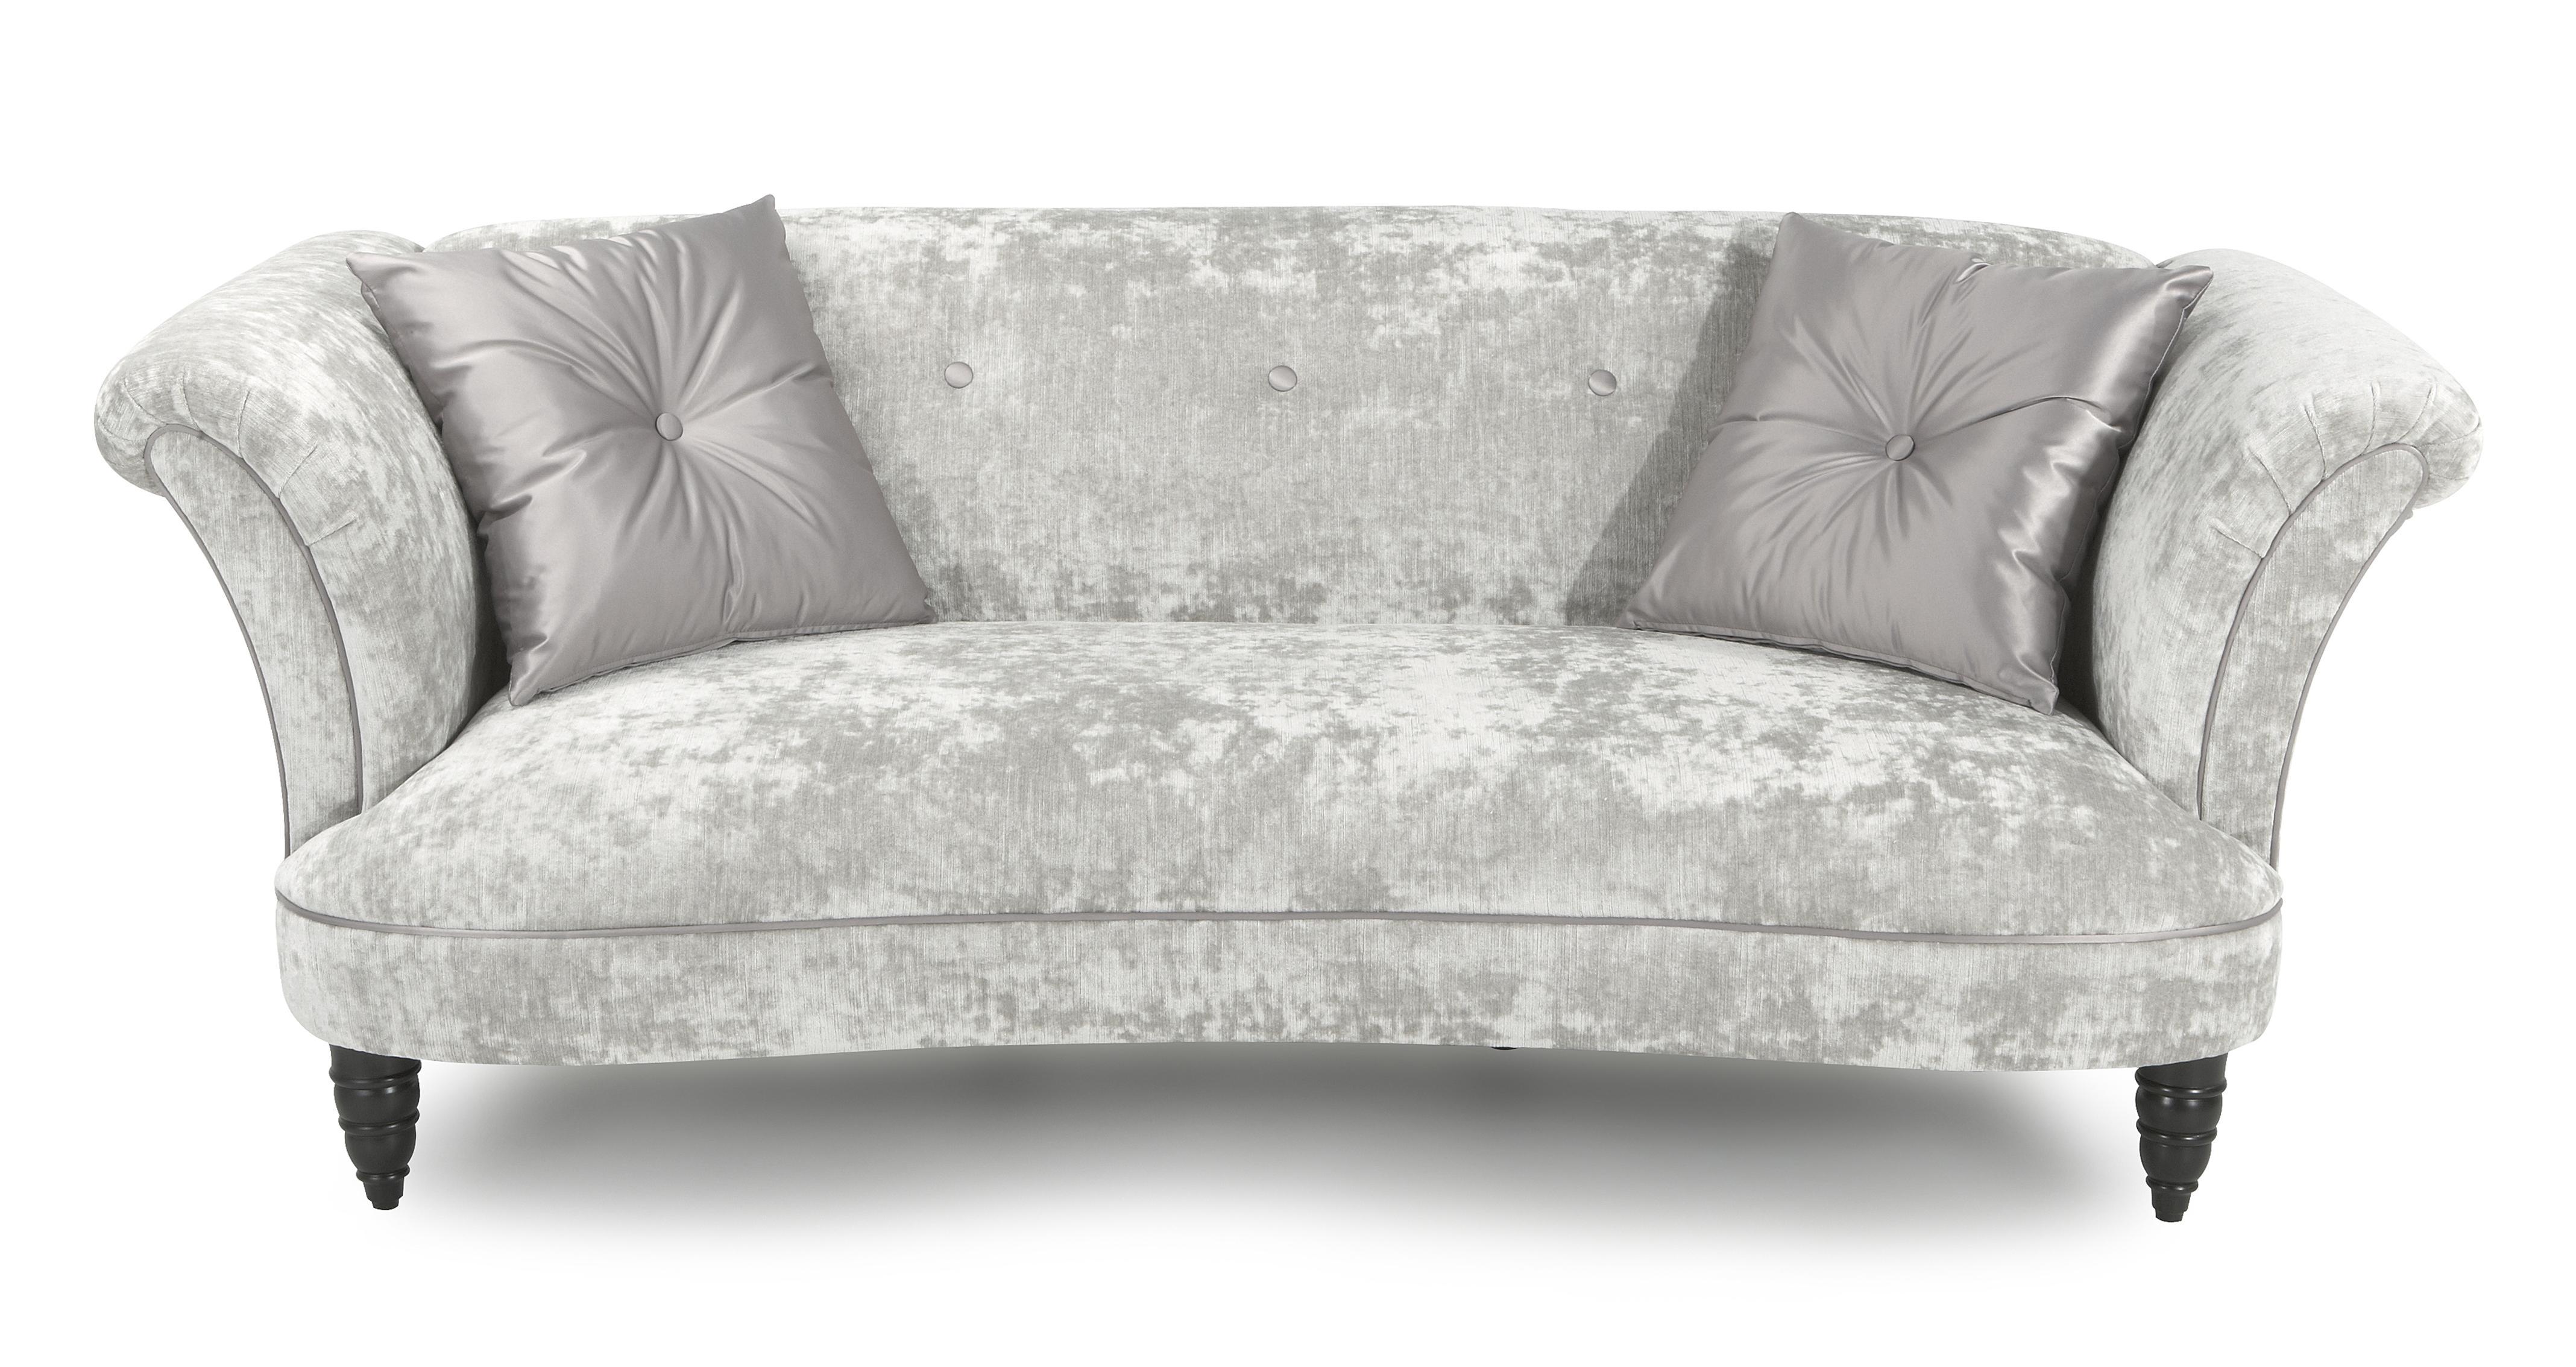 Concerto 3 Seater Sofa | DFS Ireland